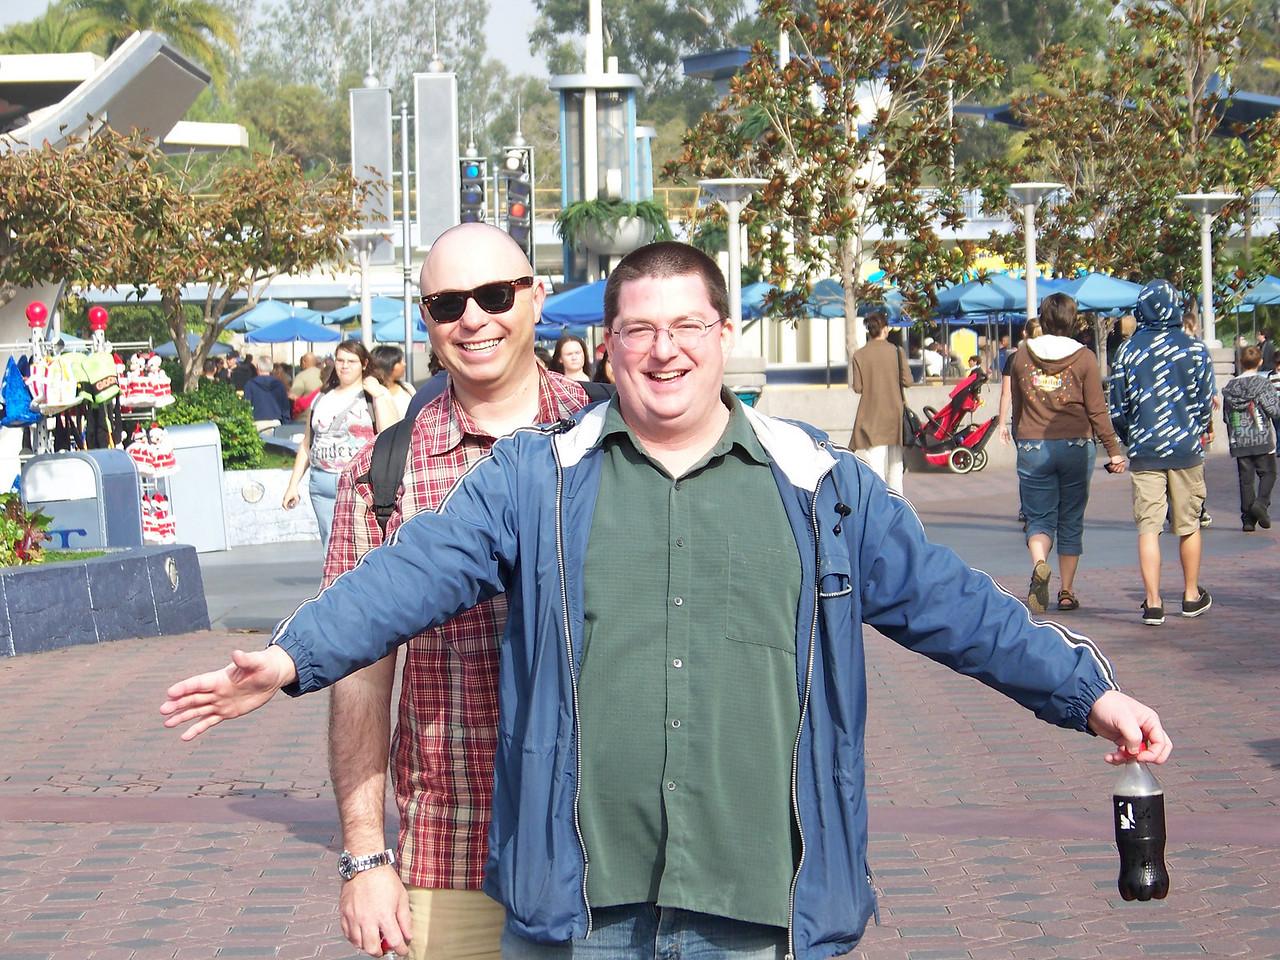 Disneyland - Tomorrowland